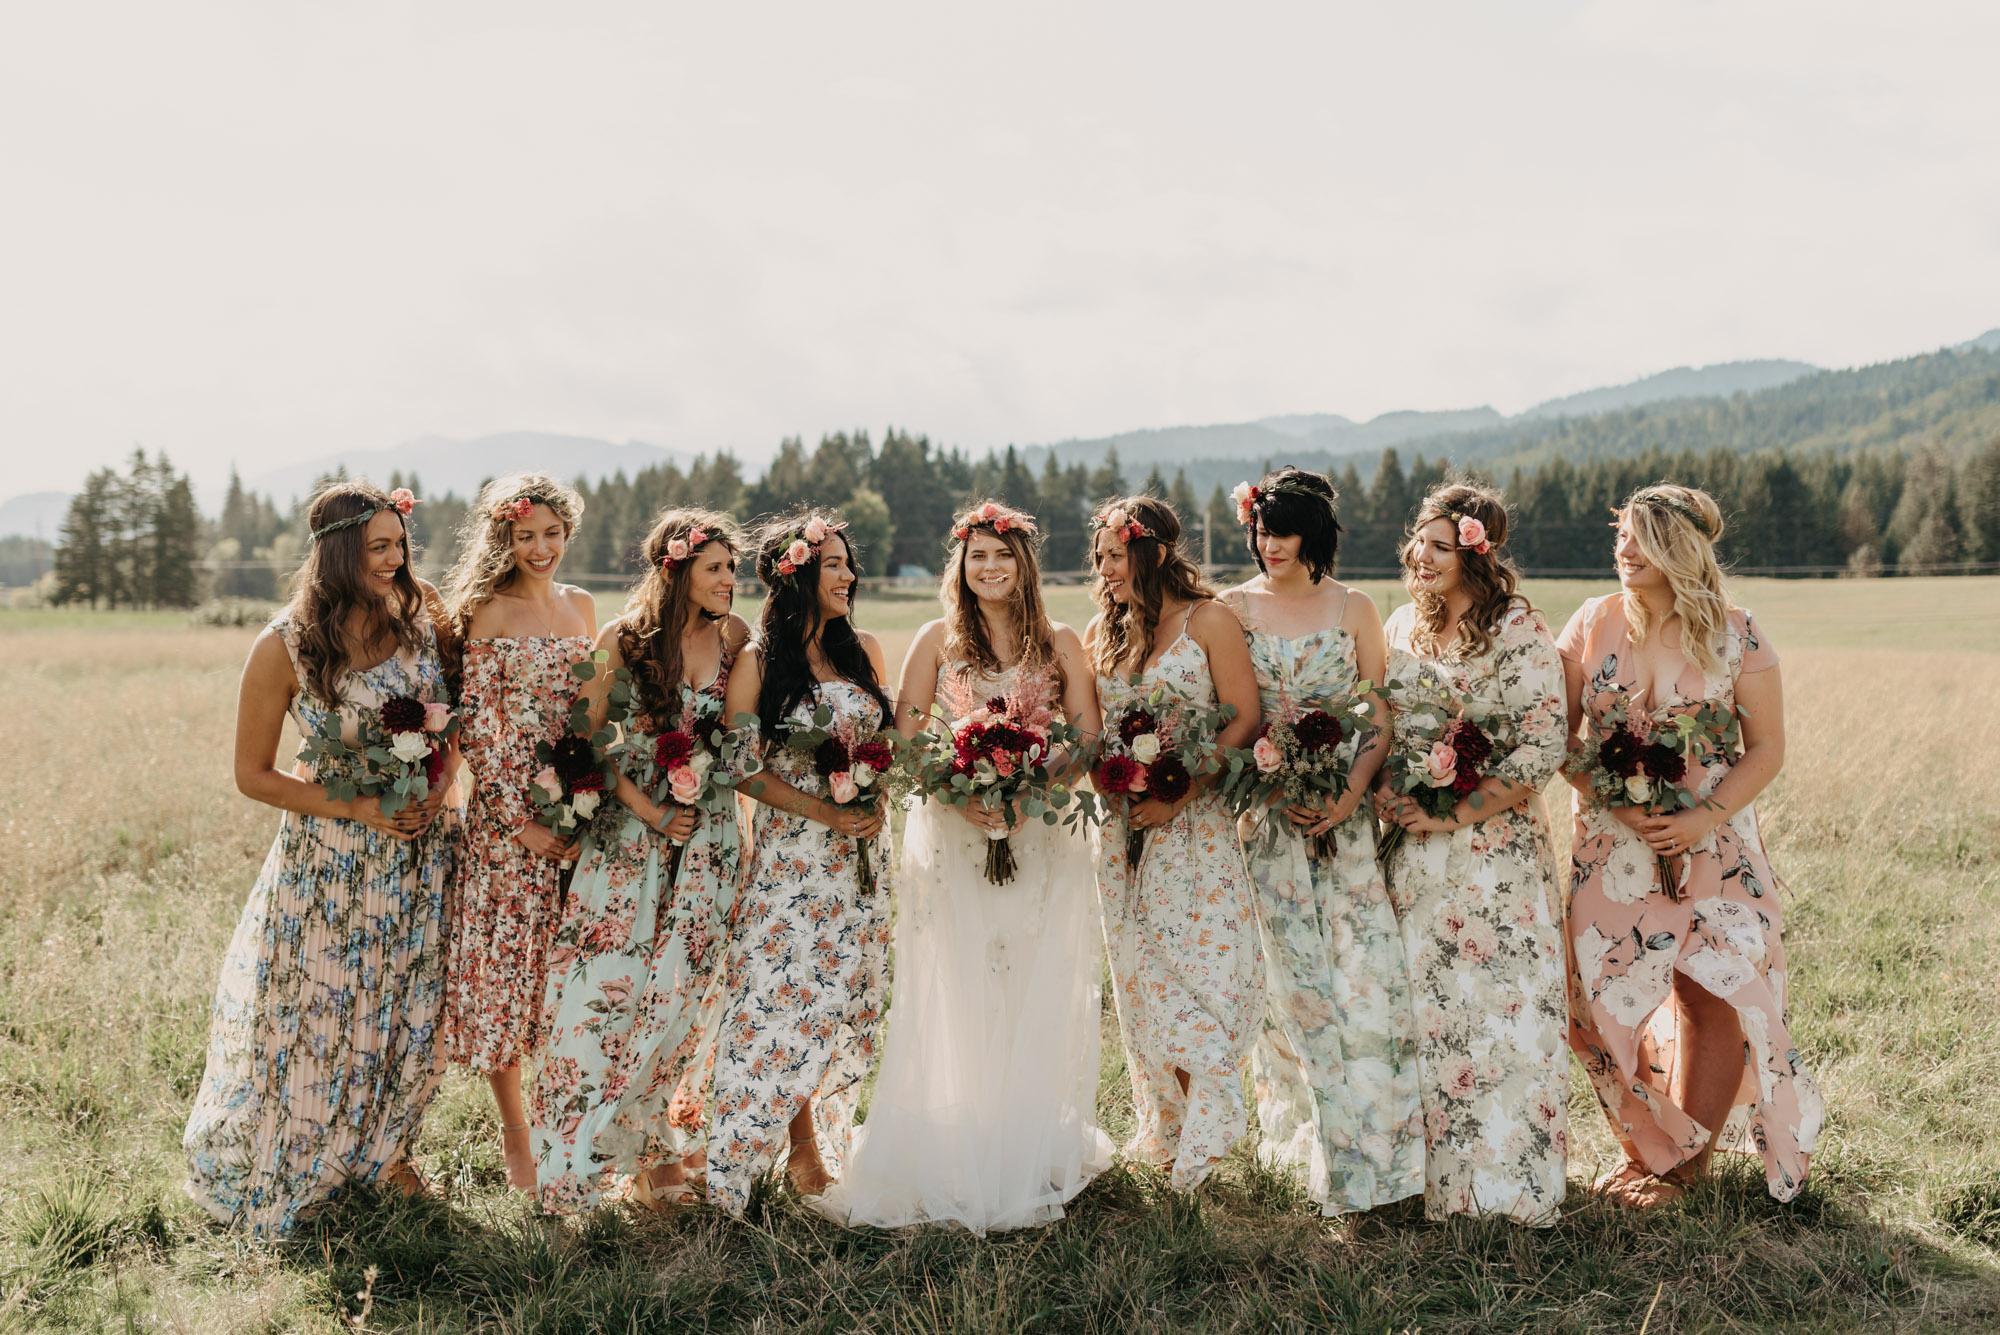 Bridal-Party-Free-People-Flower-Dresses-Washington-Wedding-8450.jpg